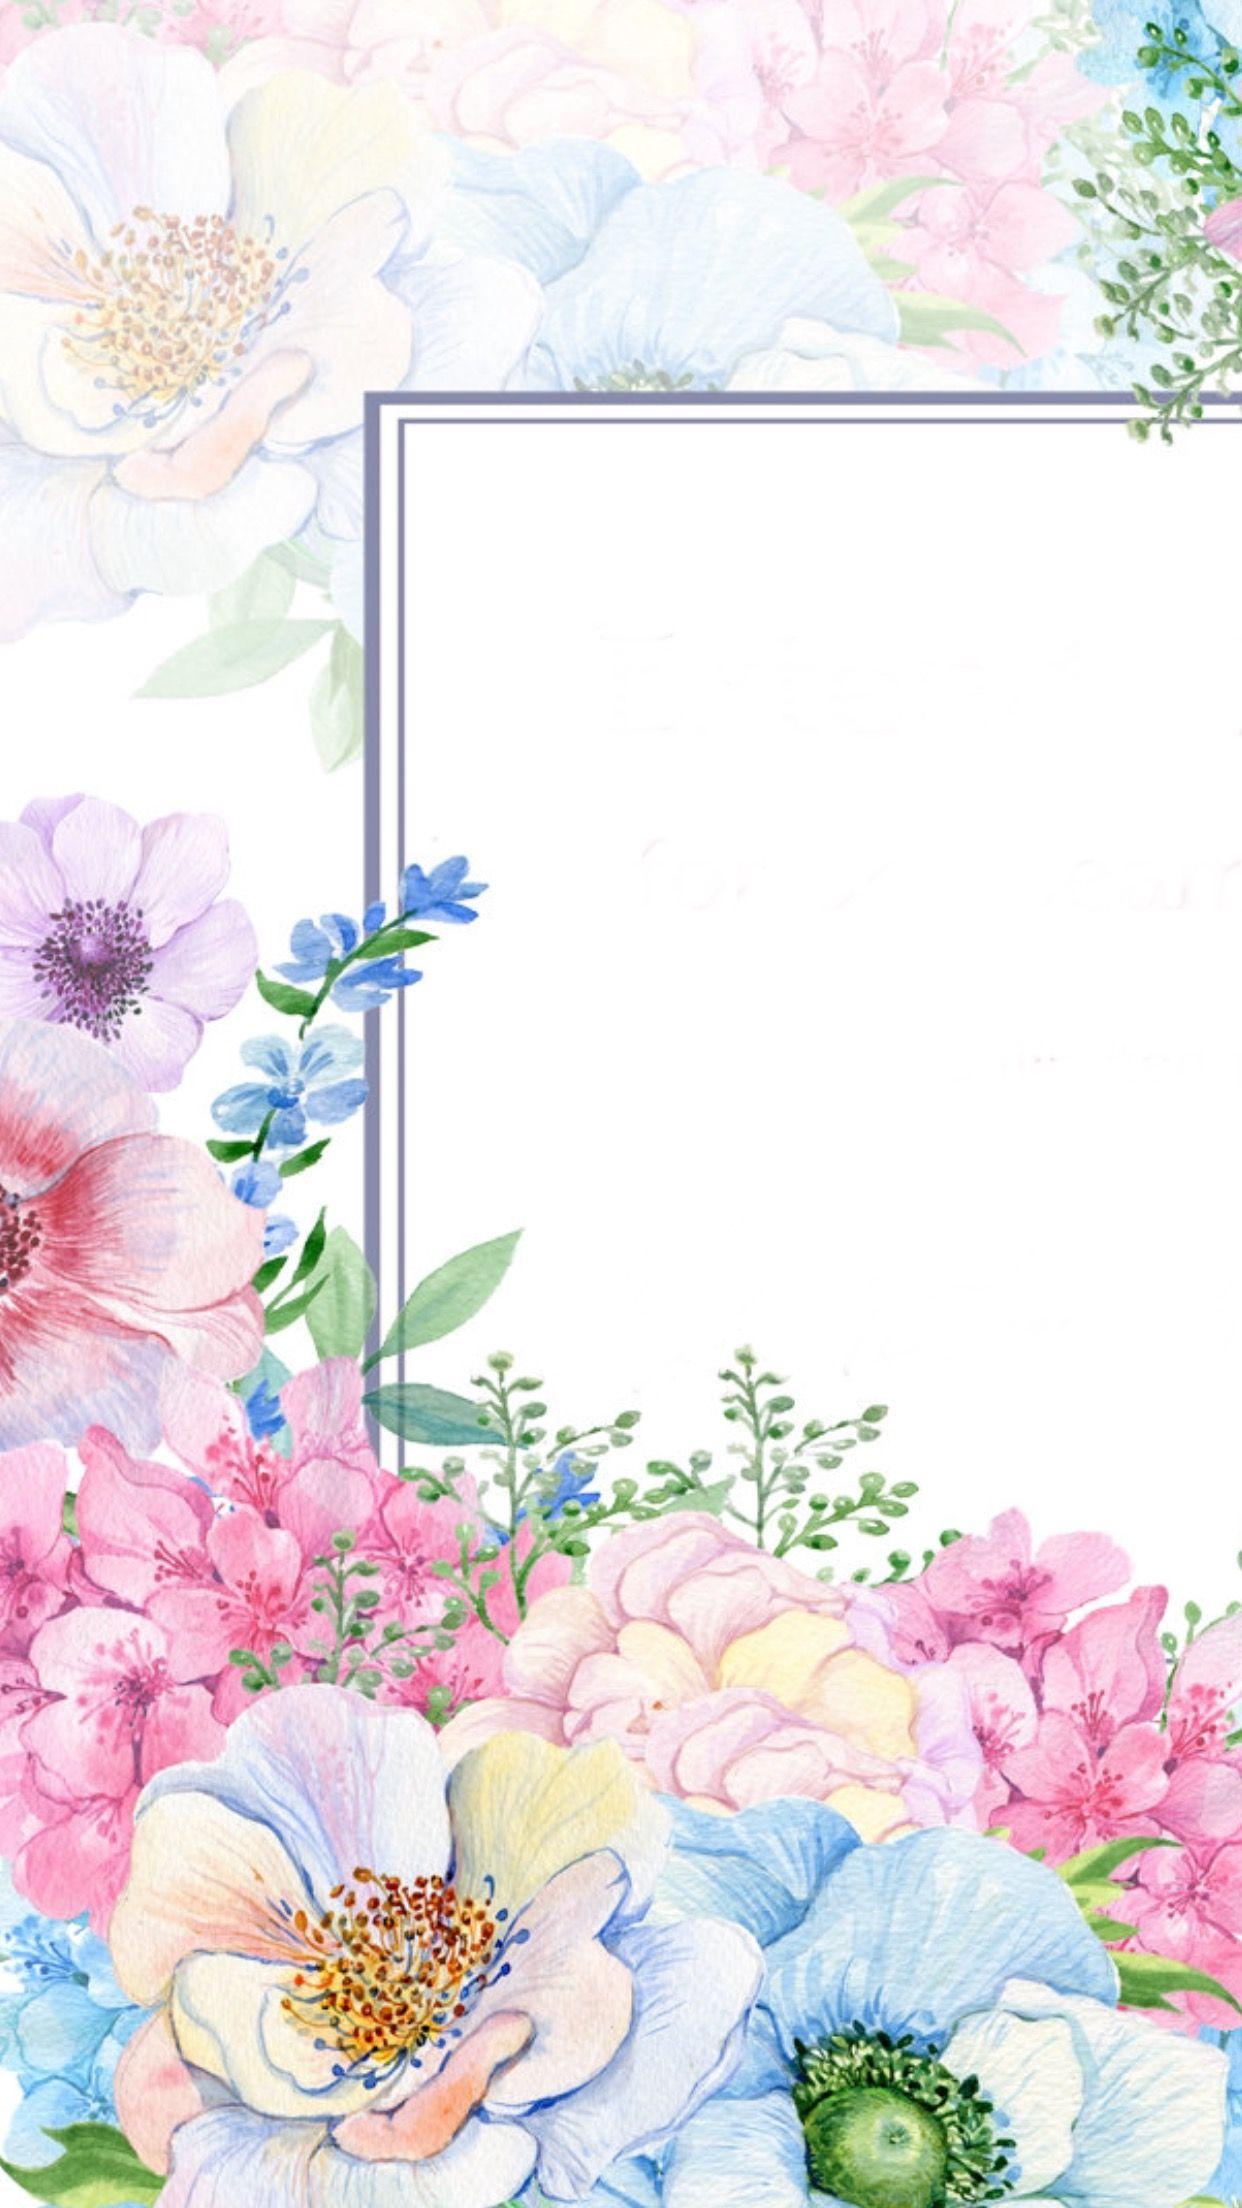 Pin By Marcela Modelli On Wallpapers Flower Background Wallpaper Flowery Wallpaper Art Wallpaper